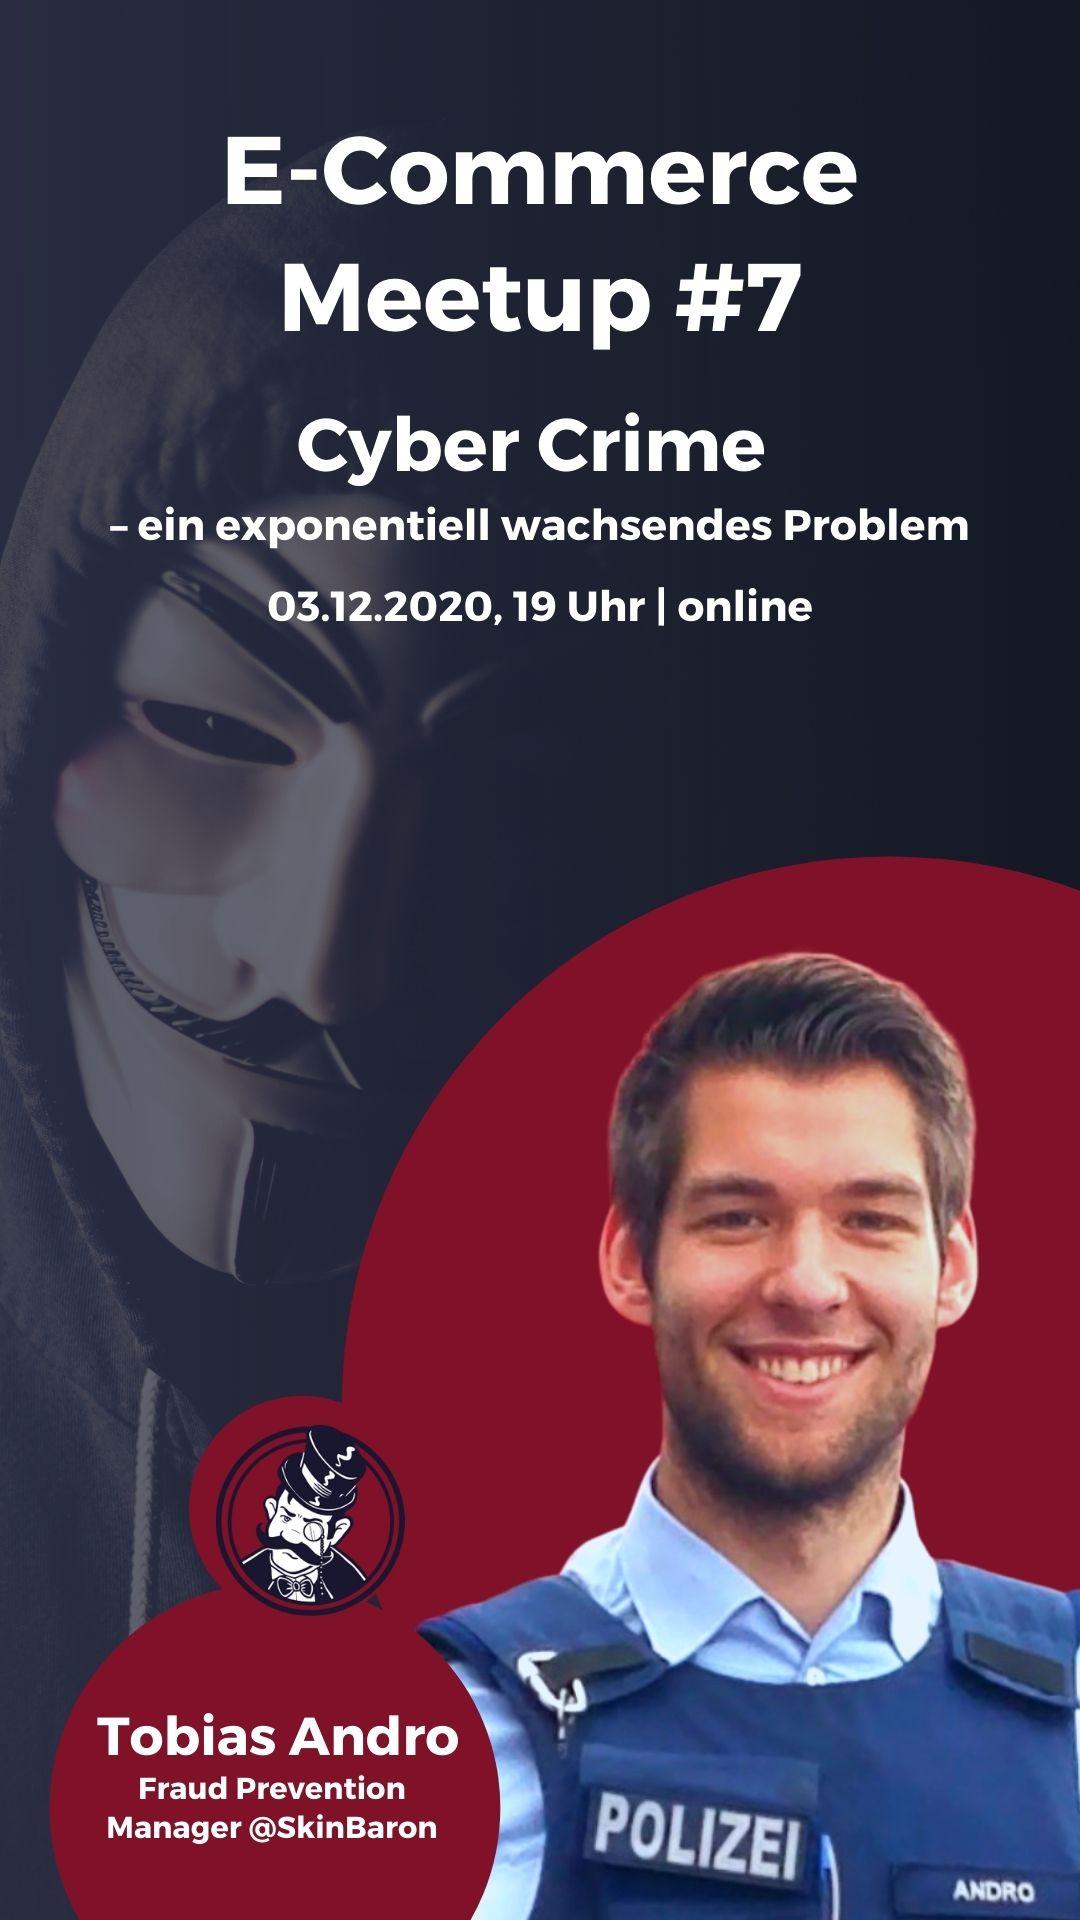 E-Commerce Meetup #7 mit Tobias Andro